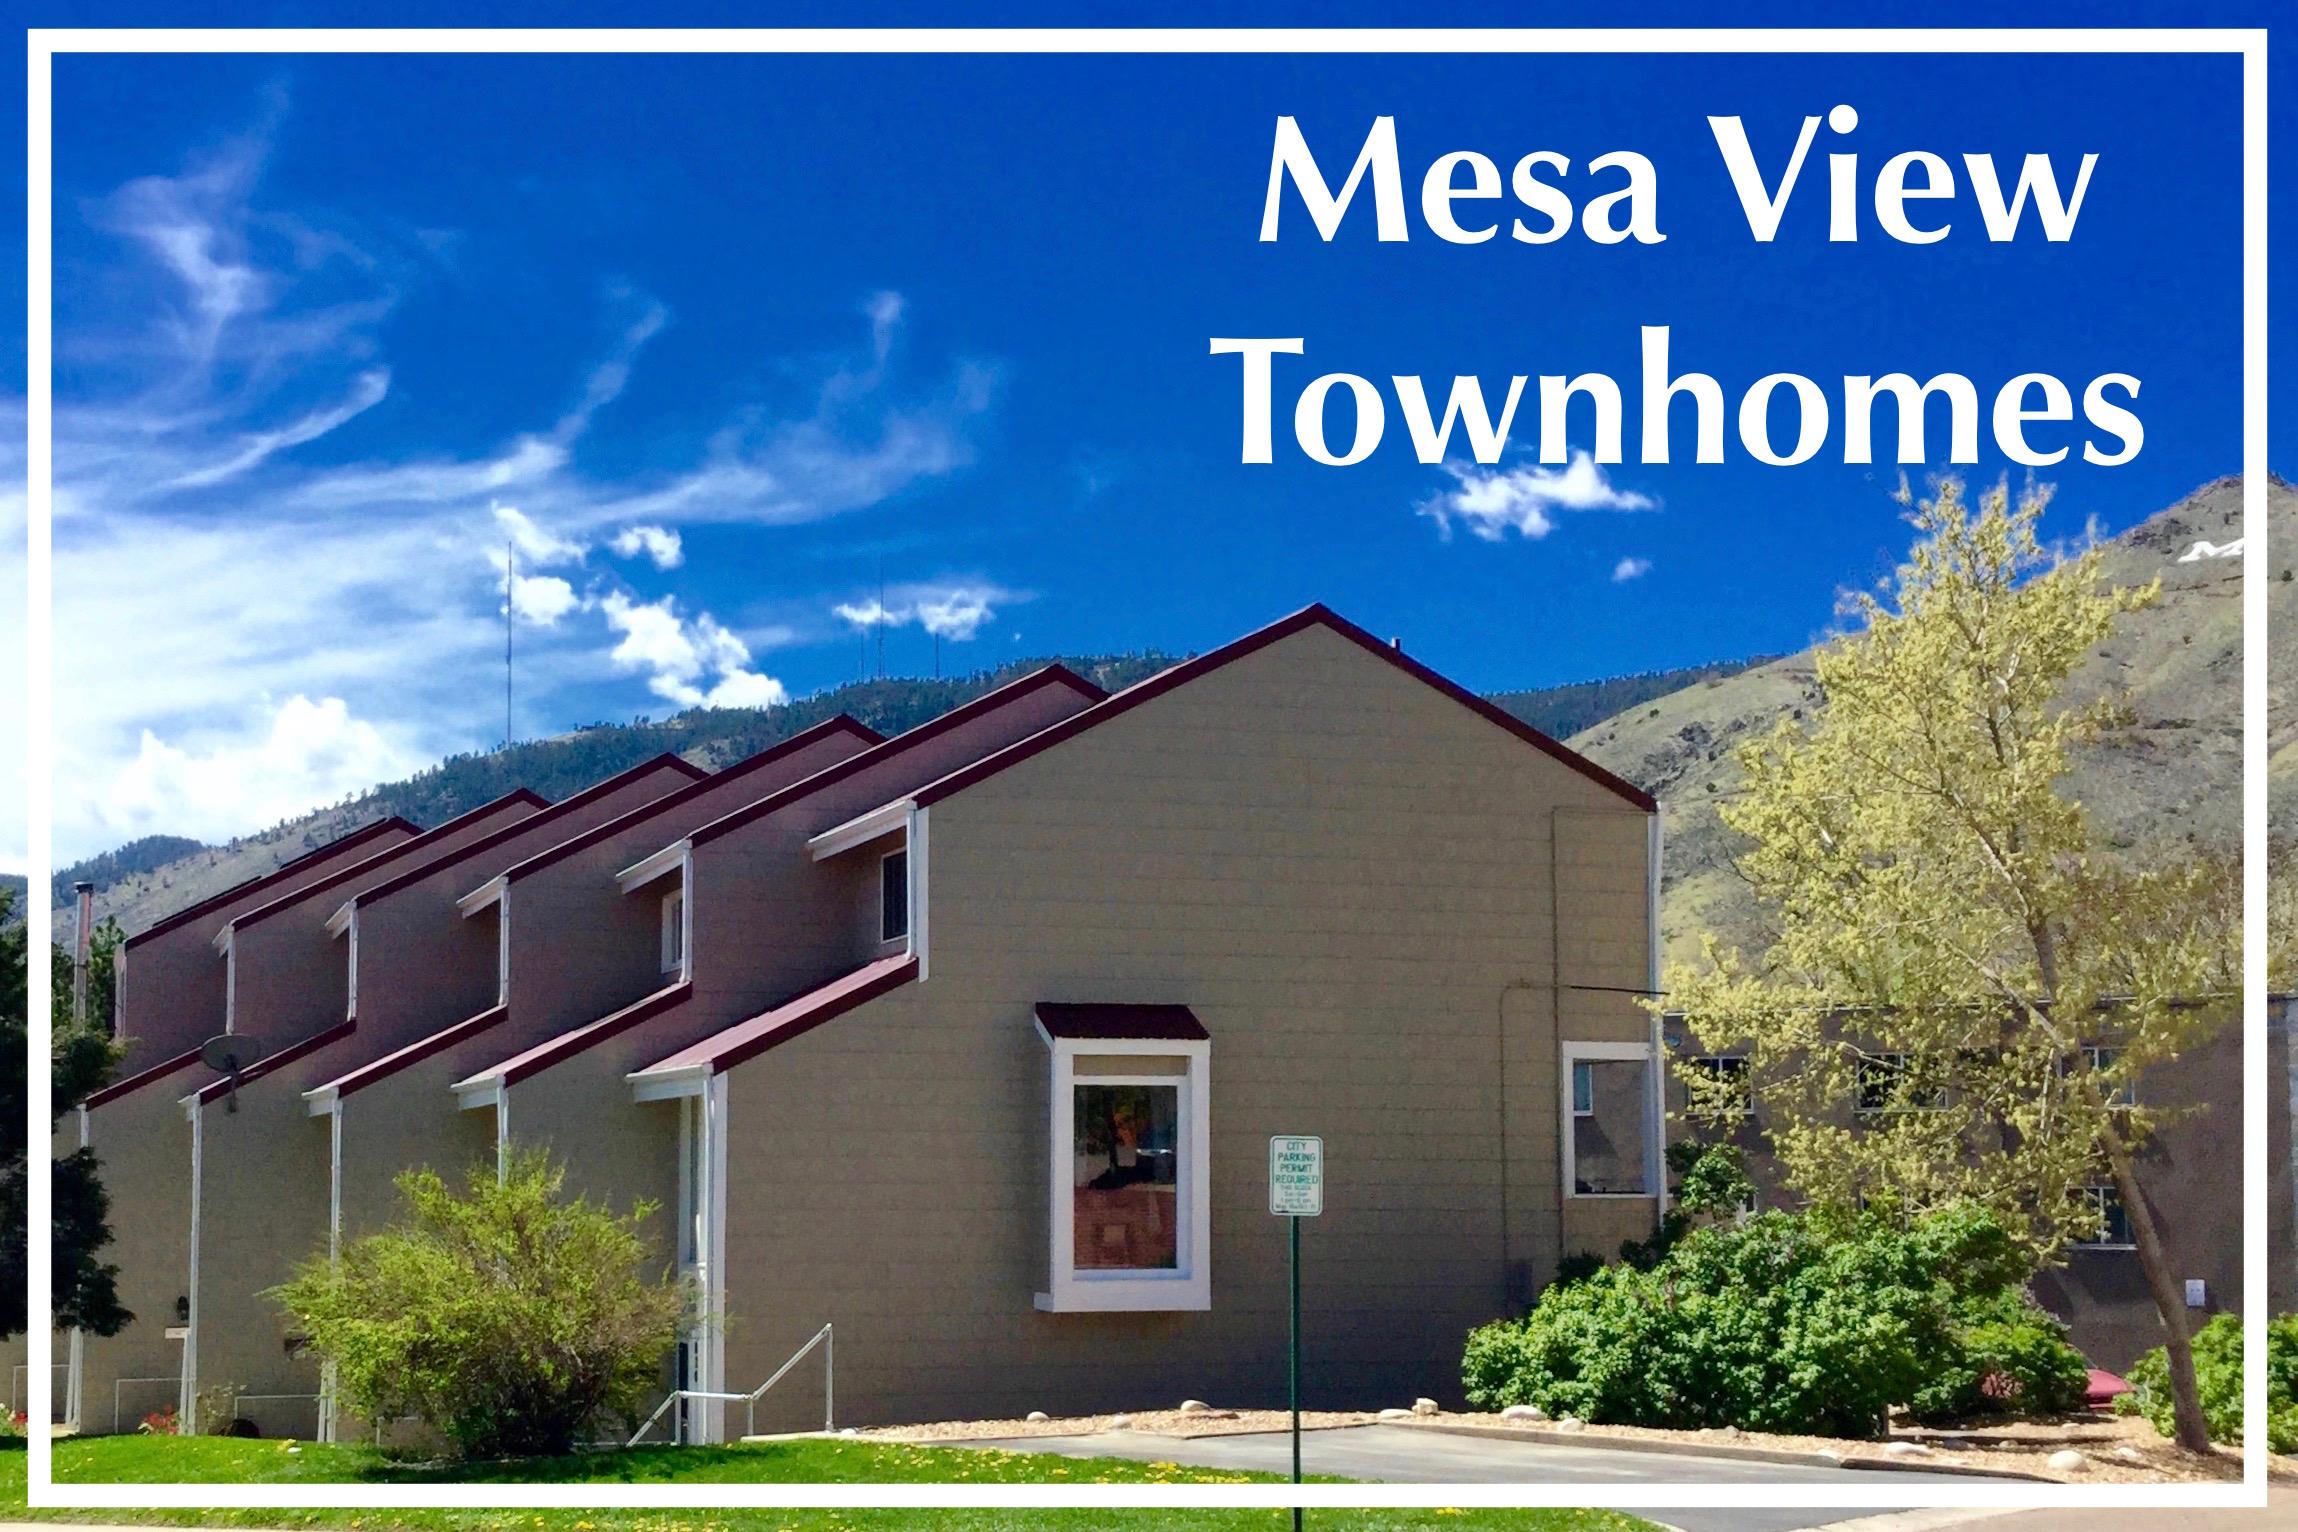 Mesa View Townhomes.jpg